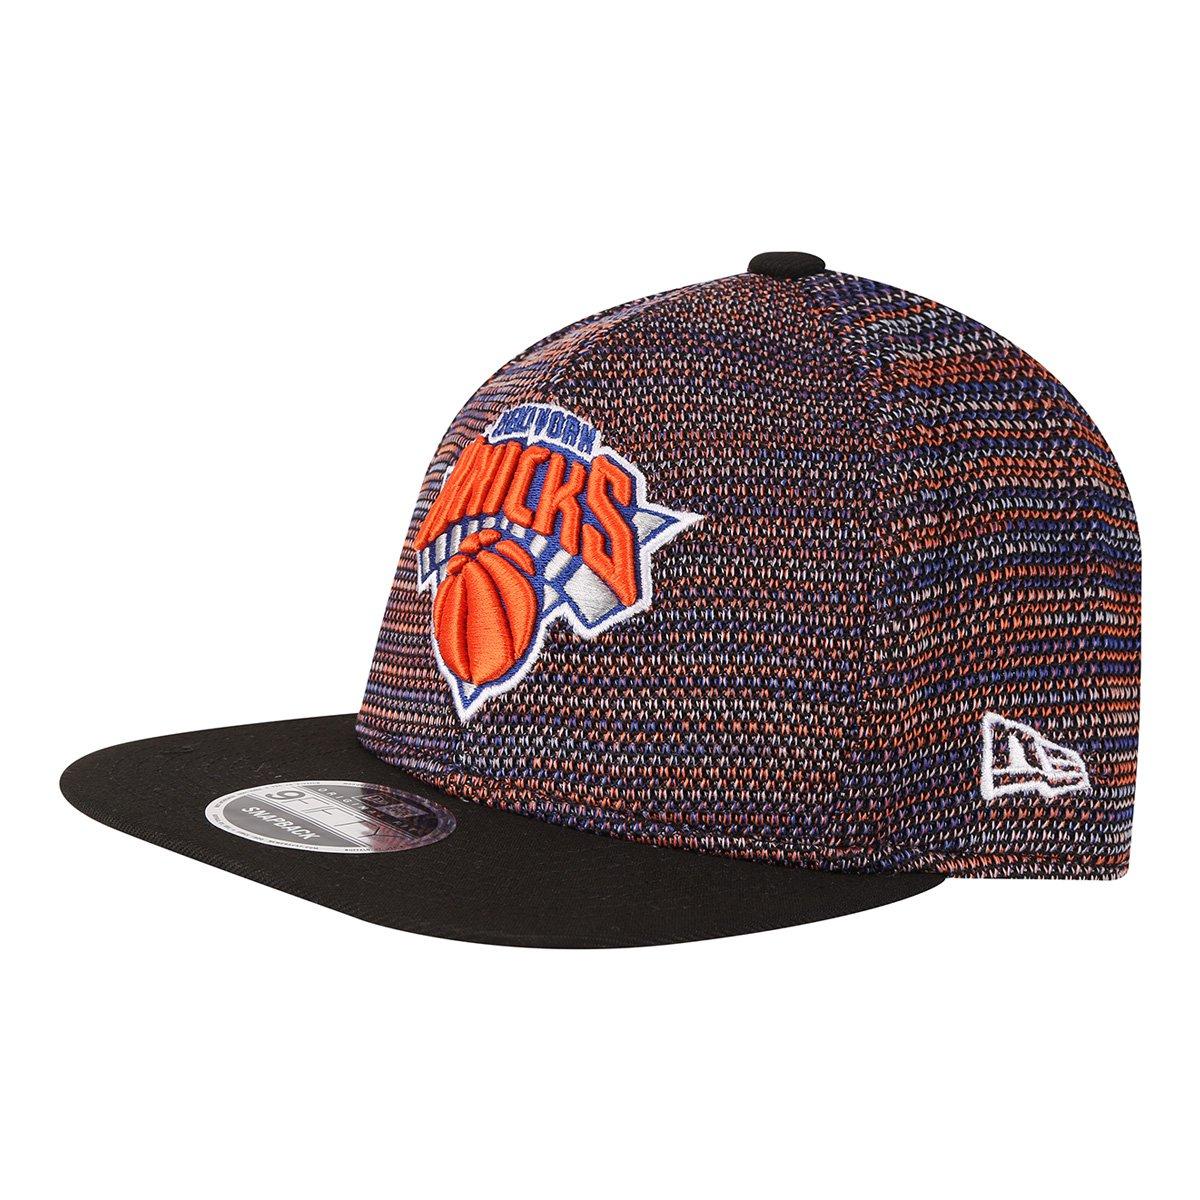 d016a92a50 Boné New Era NBA New York Knicks Aba Reta Street - Preto e Laranja | Loja  NBA